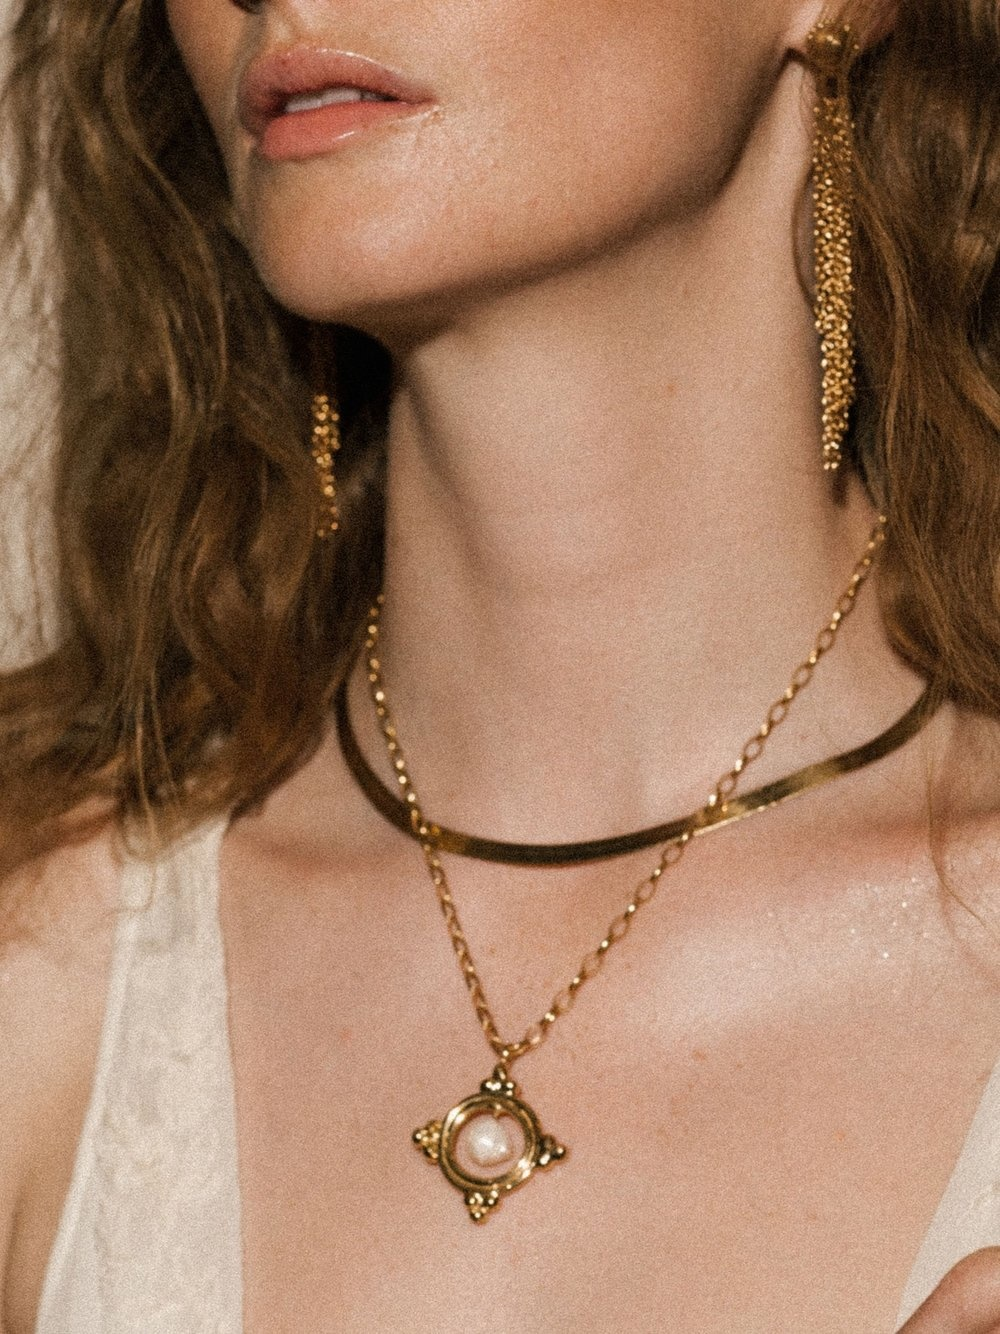 Pamela Card Necklace - Granada - 24K Gold Plated